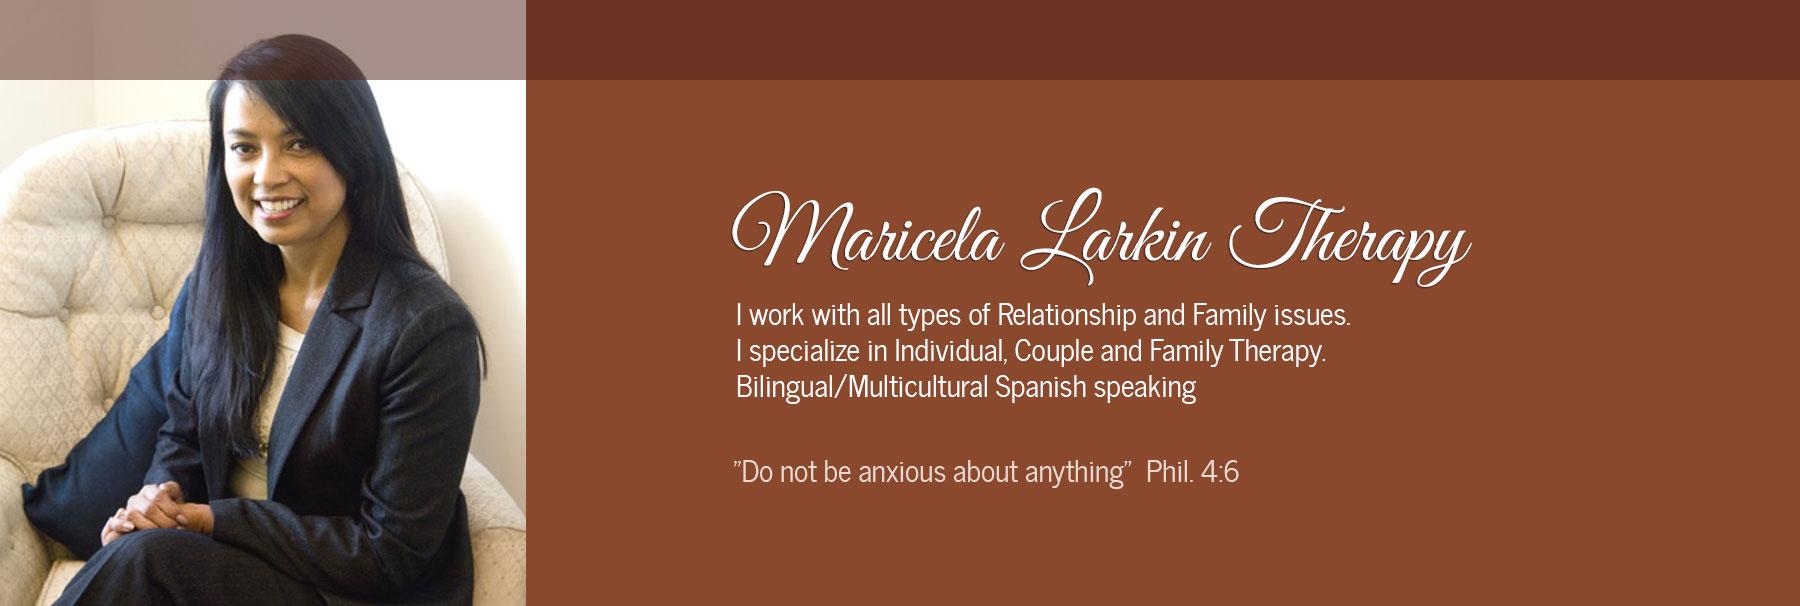 Maricela Larkin Therapy